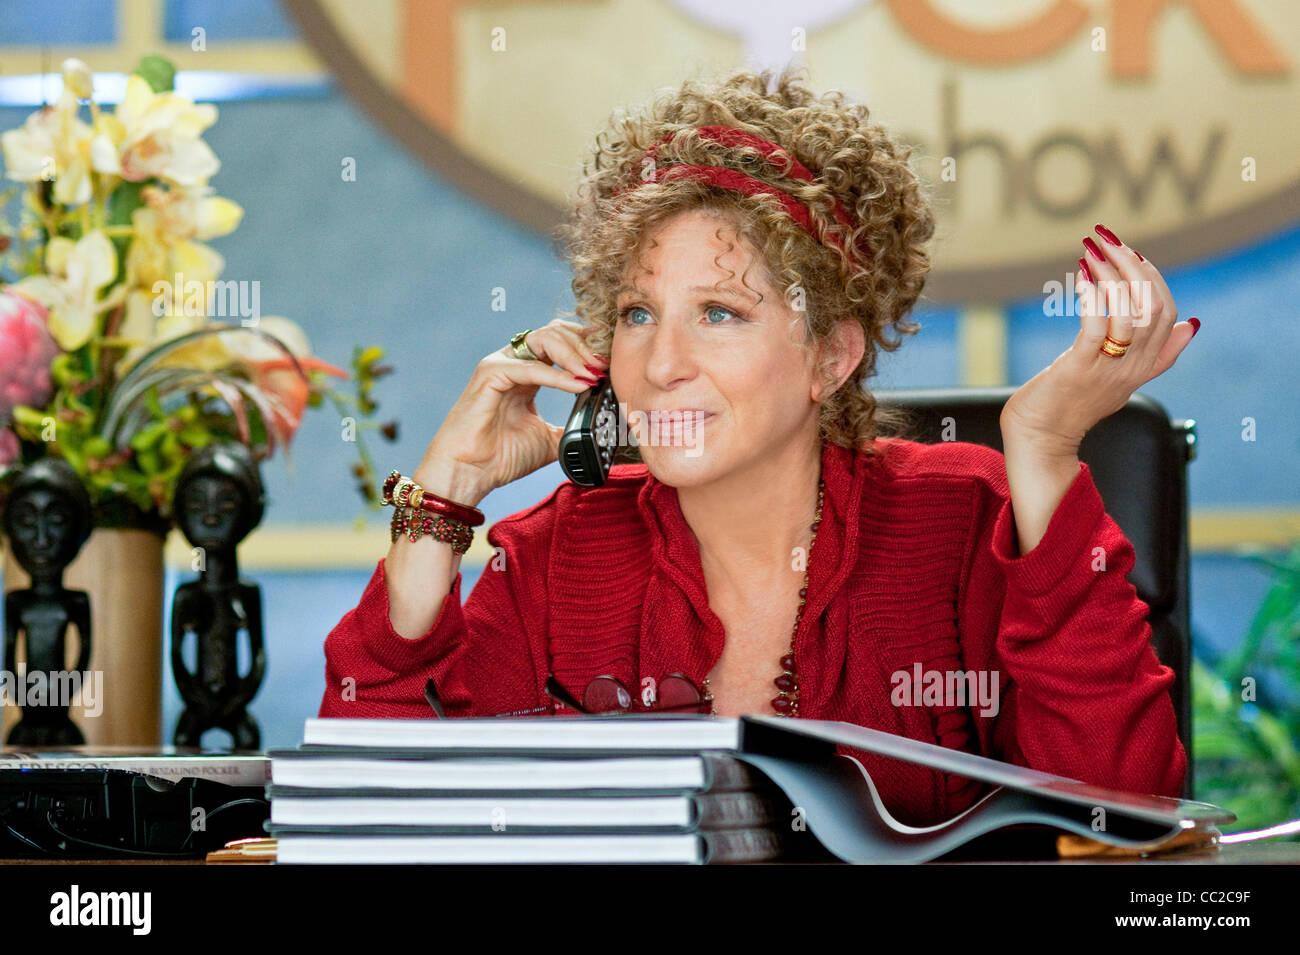 Barbra Streisand Little Fockers 2010 Stock Photo Alamy